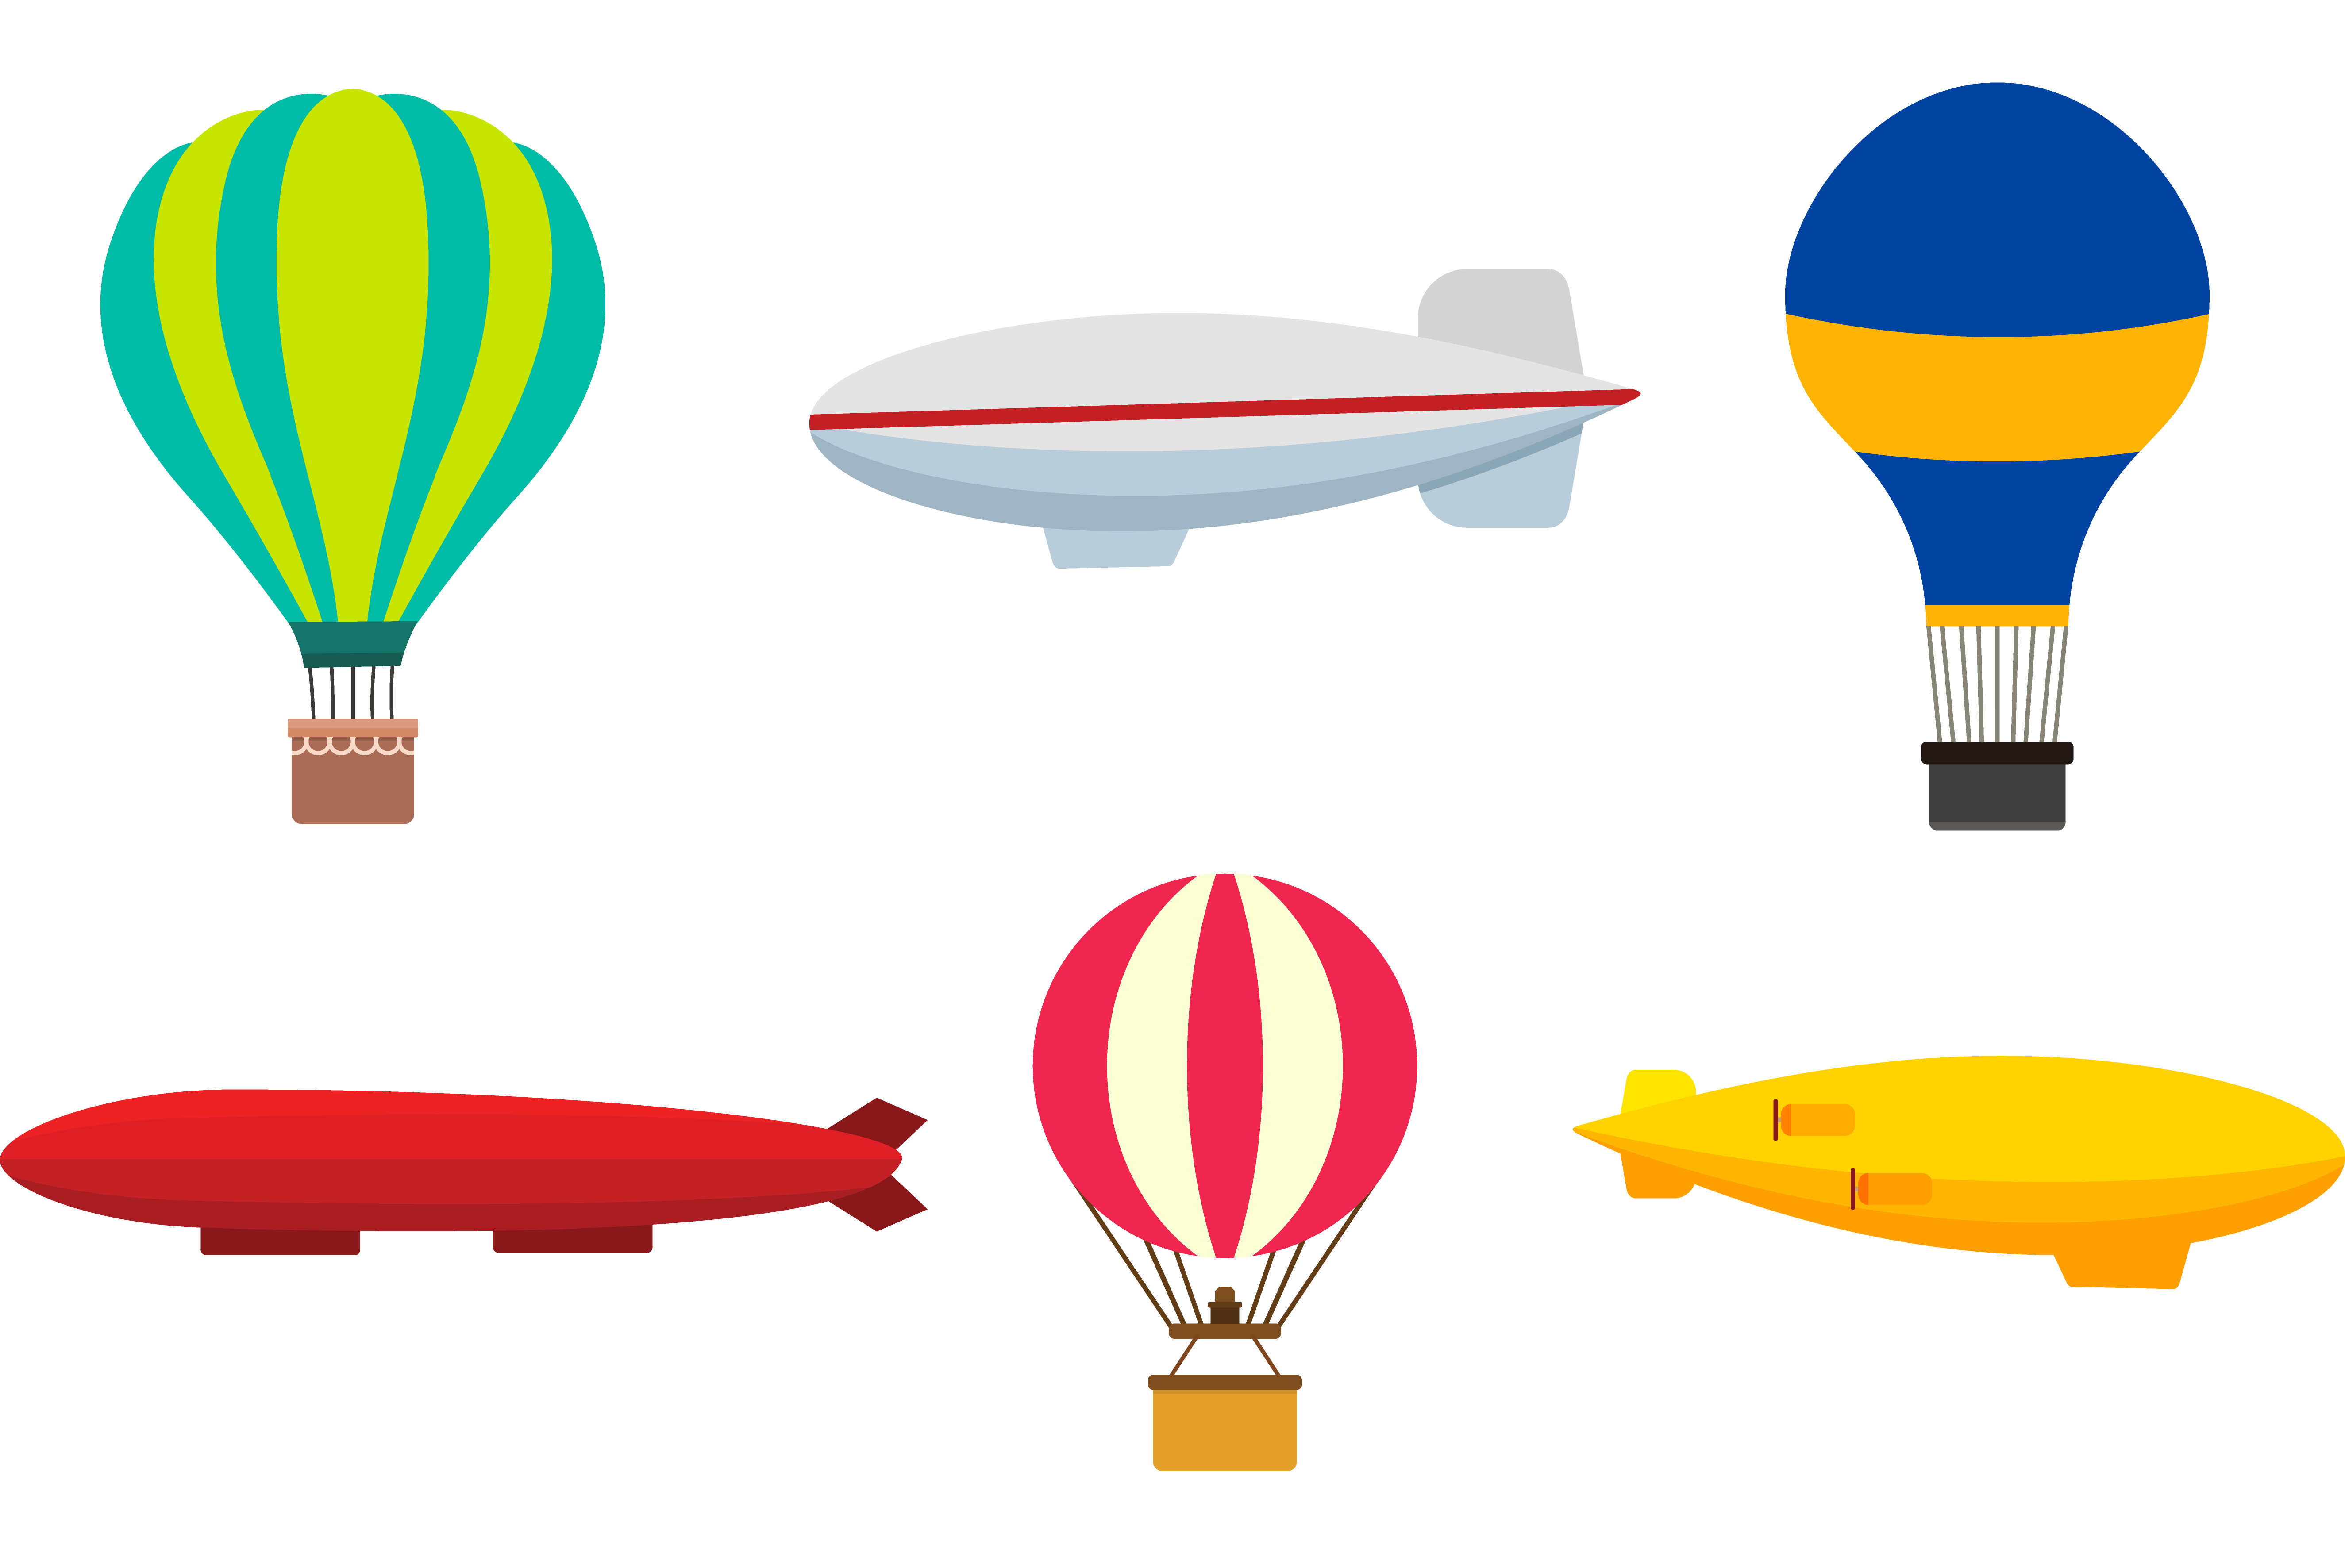 Set transprent png free. Clipart rocket balloon